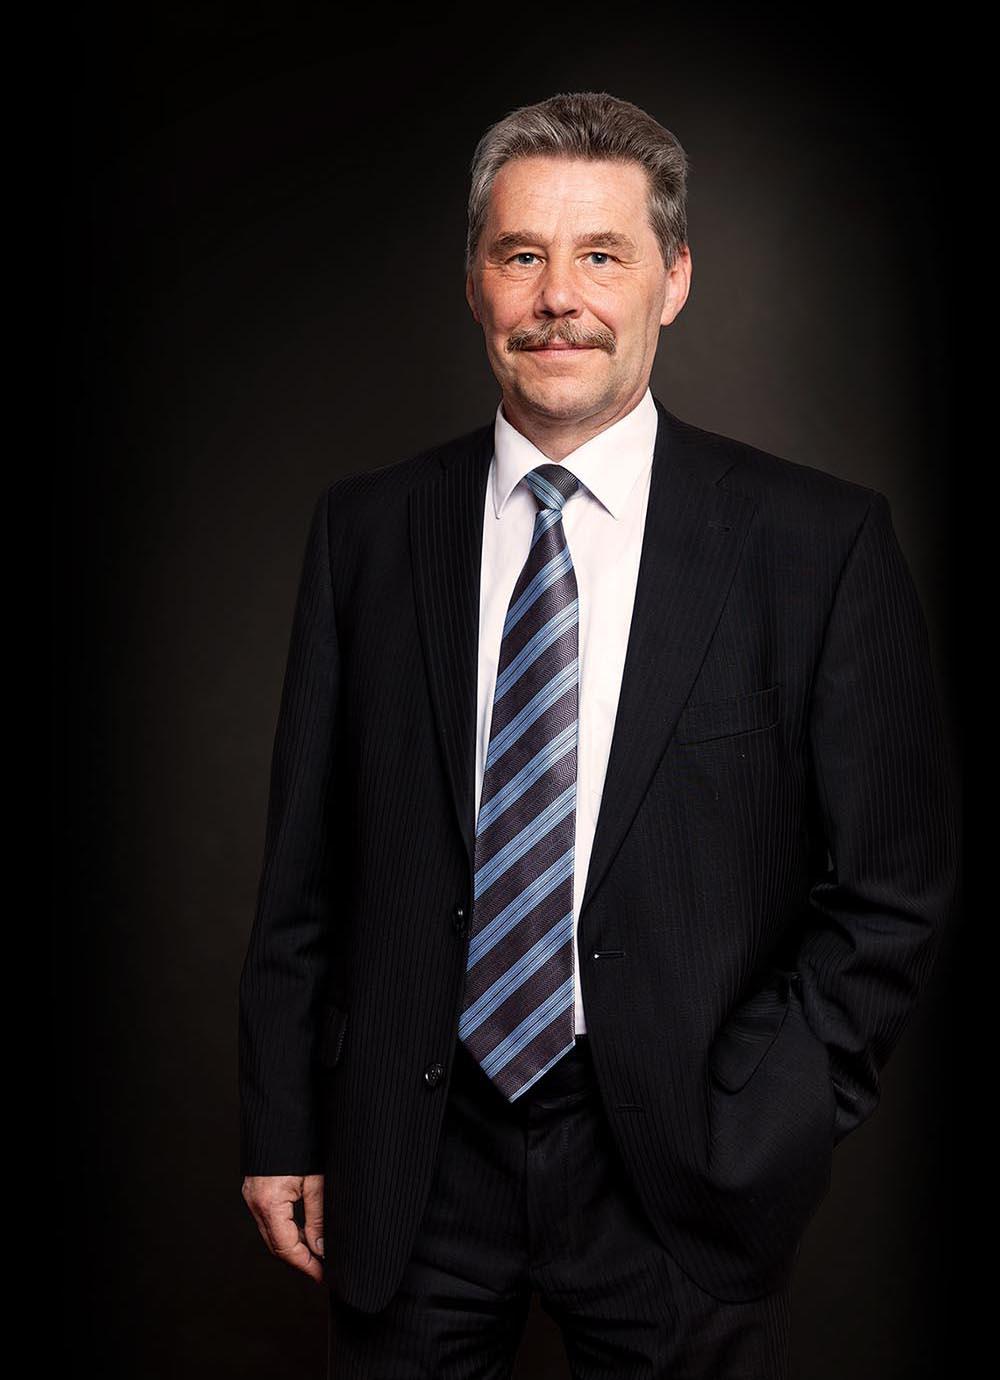 Dr. Frank Lohse